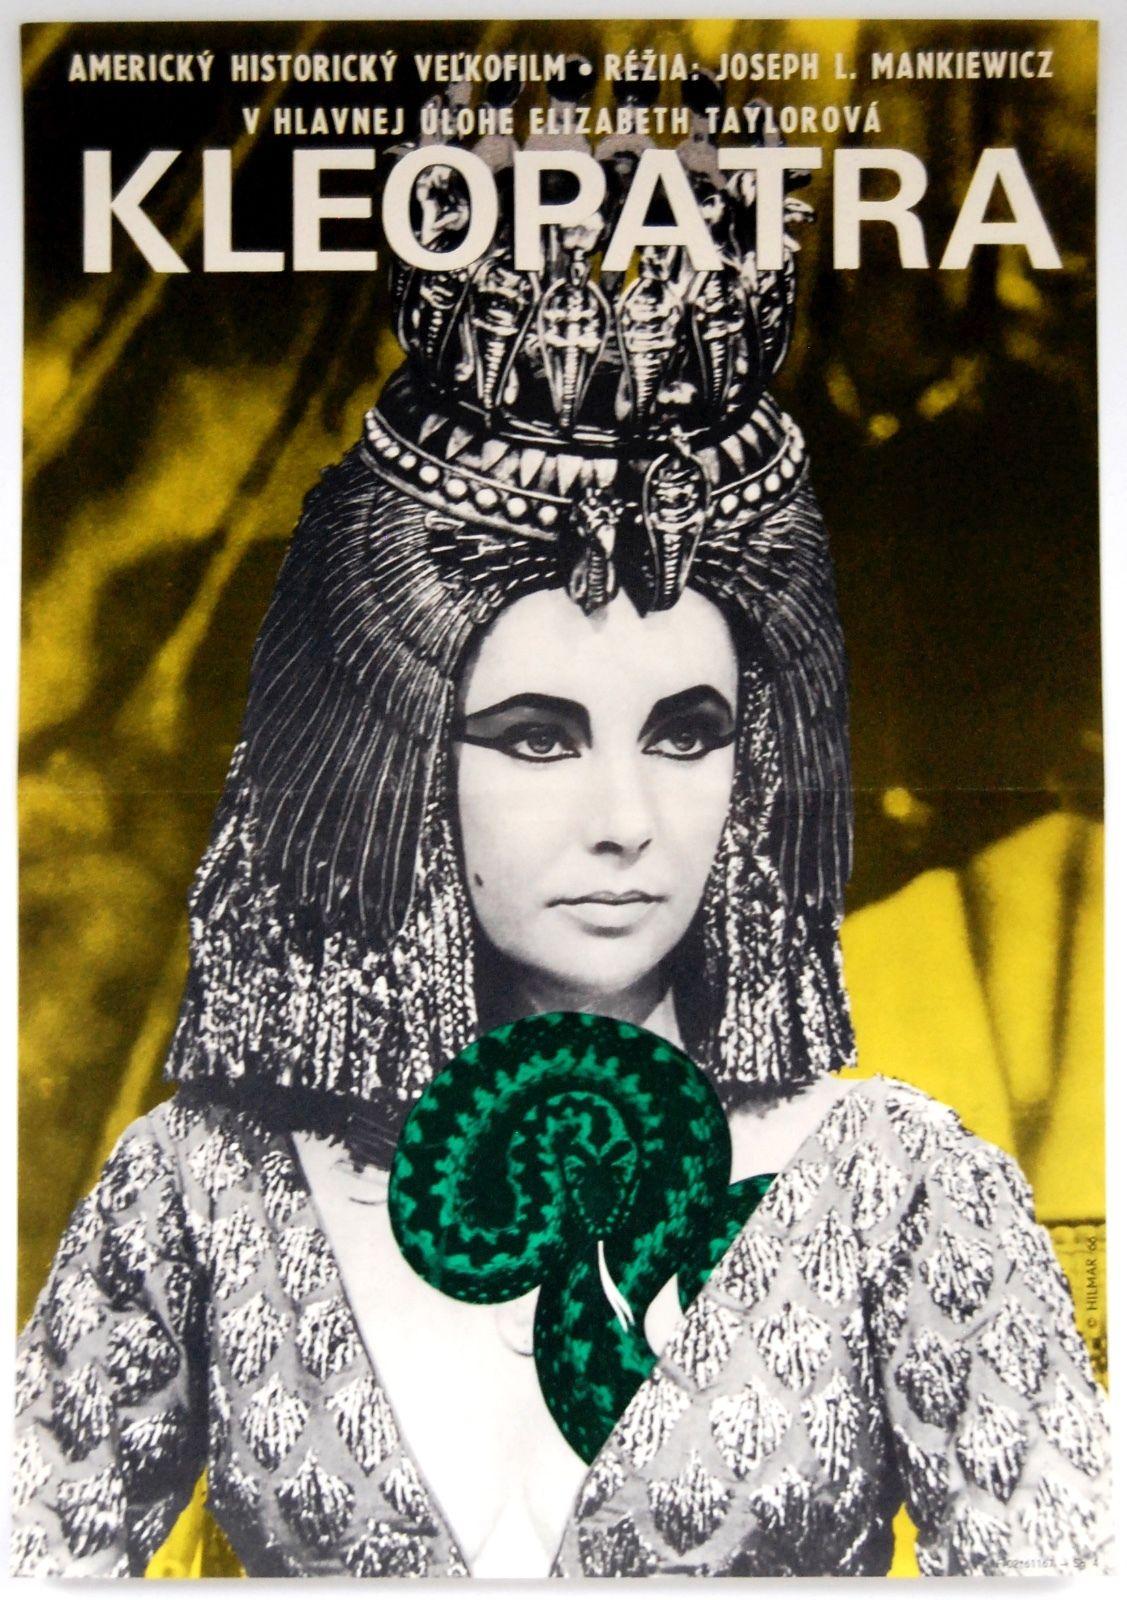 elizabeth-taylor-cleopatra-original-1964-czech-movie-poster